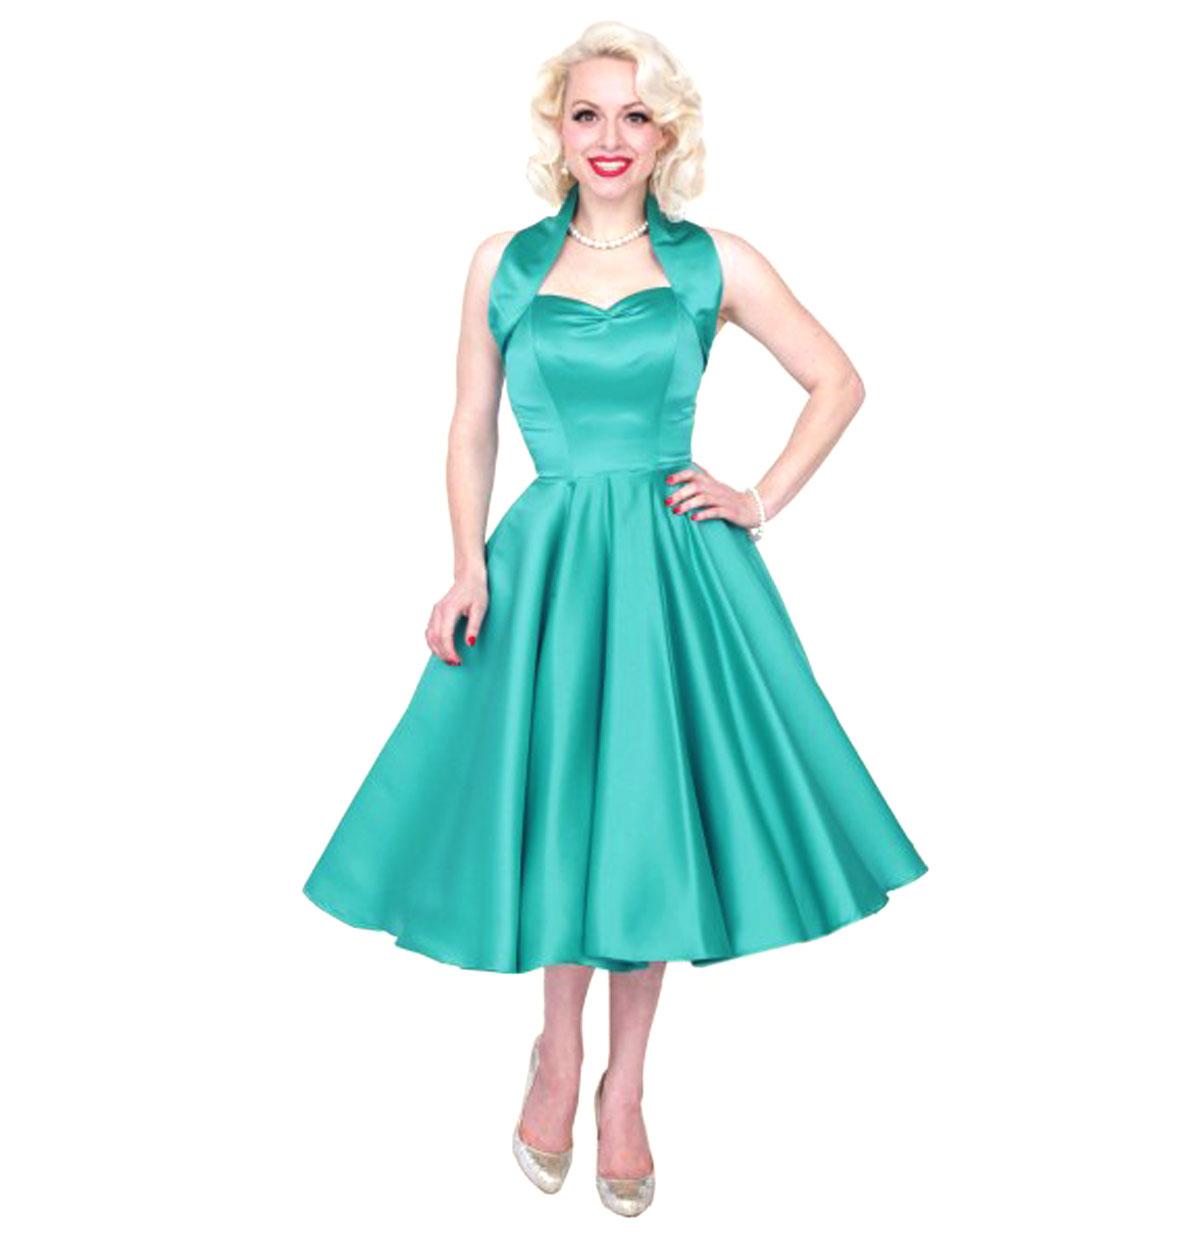 Duchess Satin Dress Turquoise